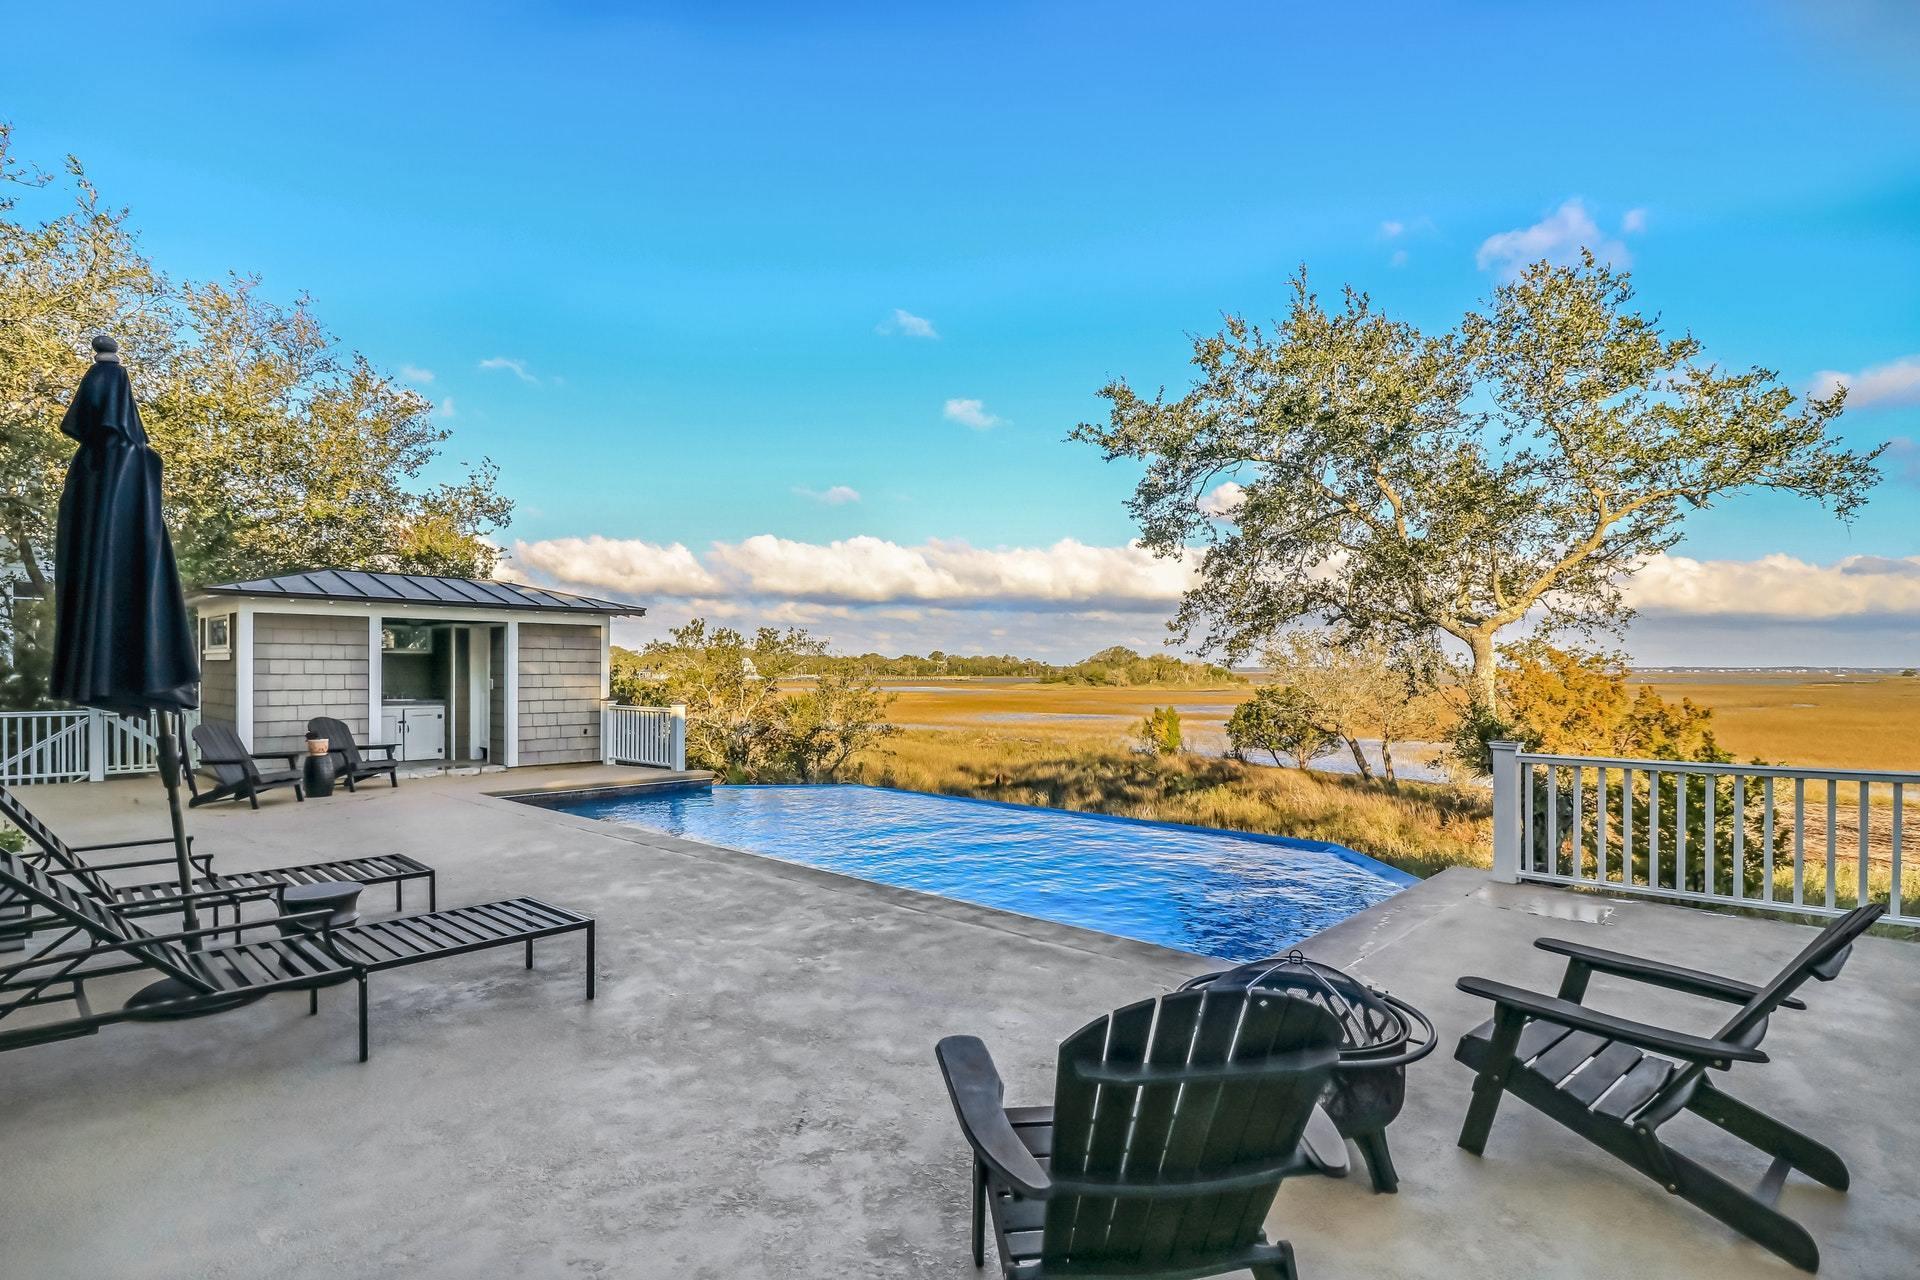 Waterway Island Homes For Sale - 7 Waterway Island Drive, Isle of Palms, SC - 29